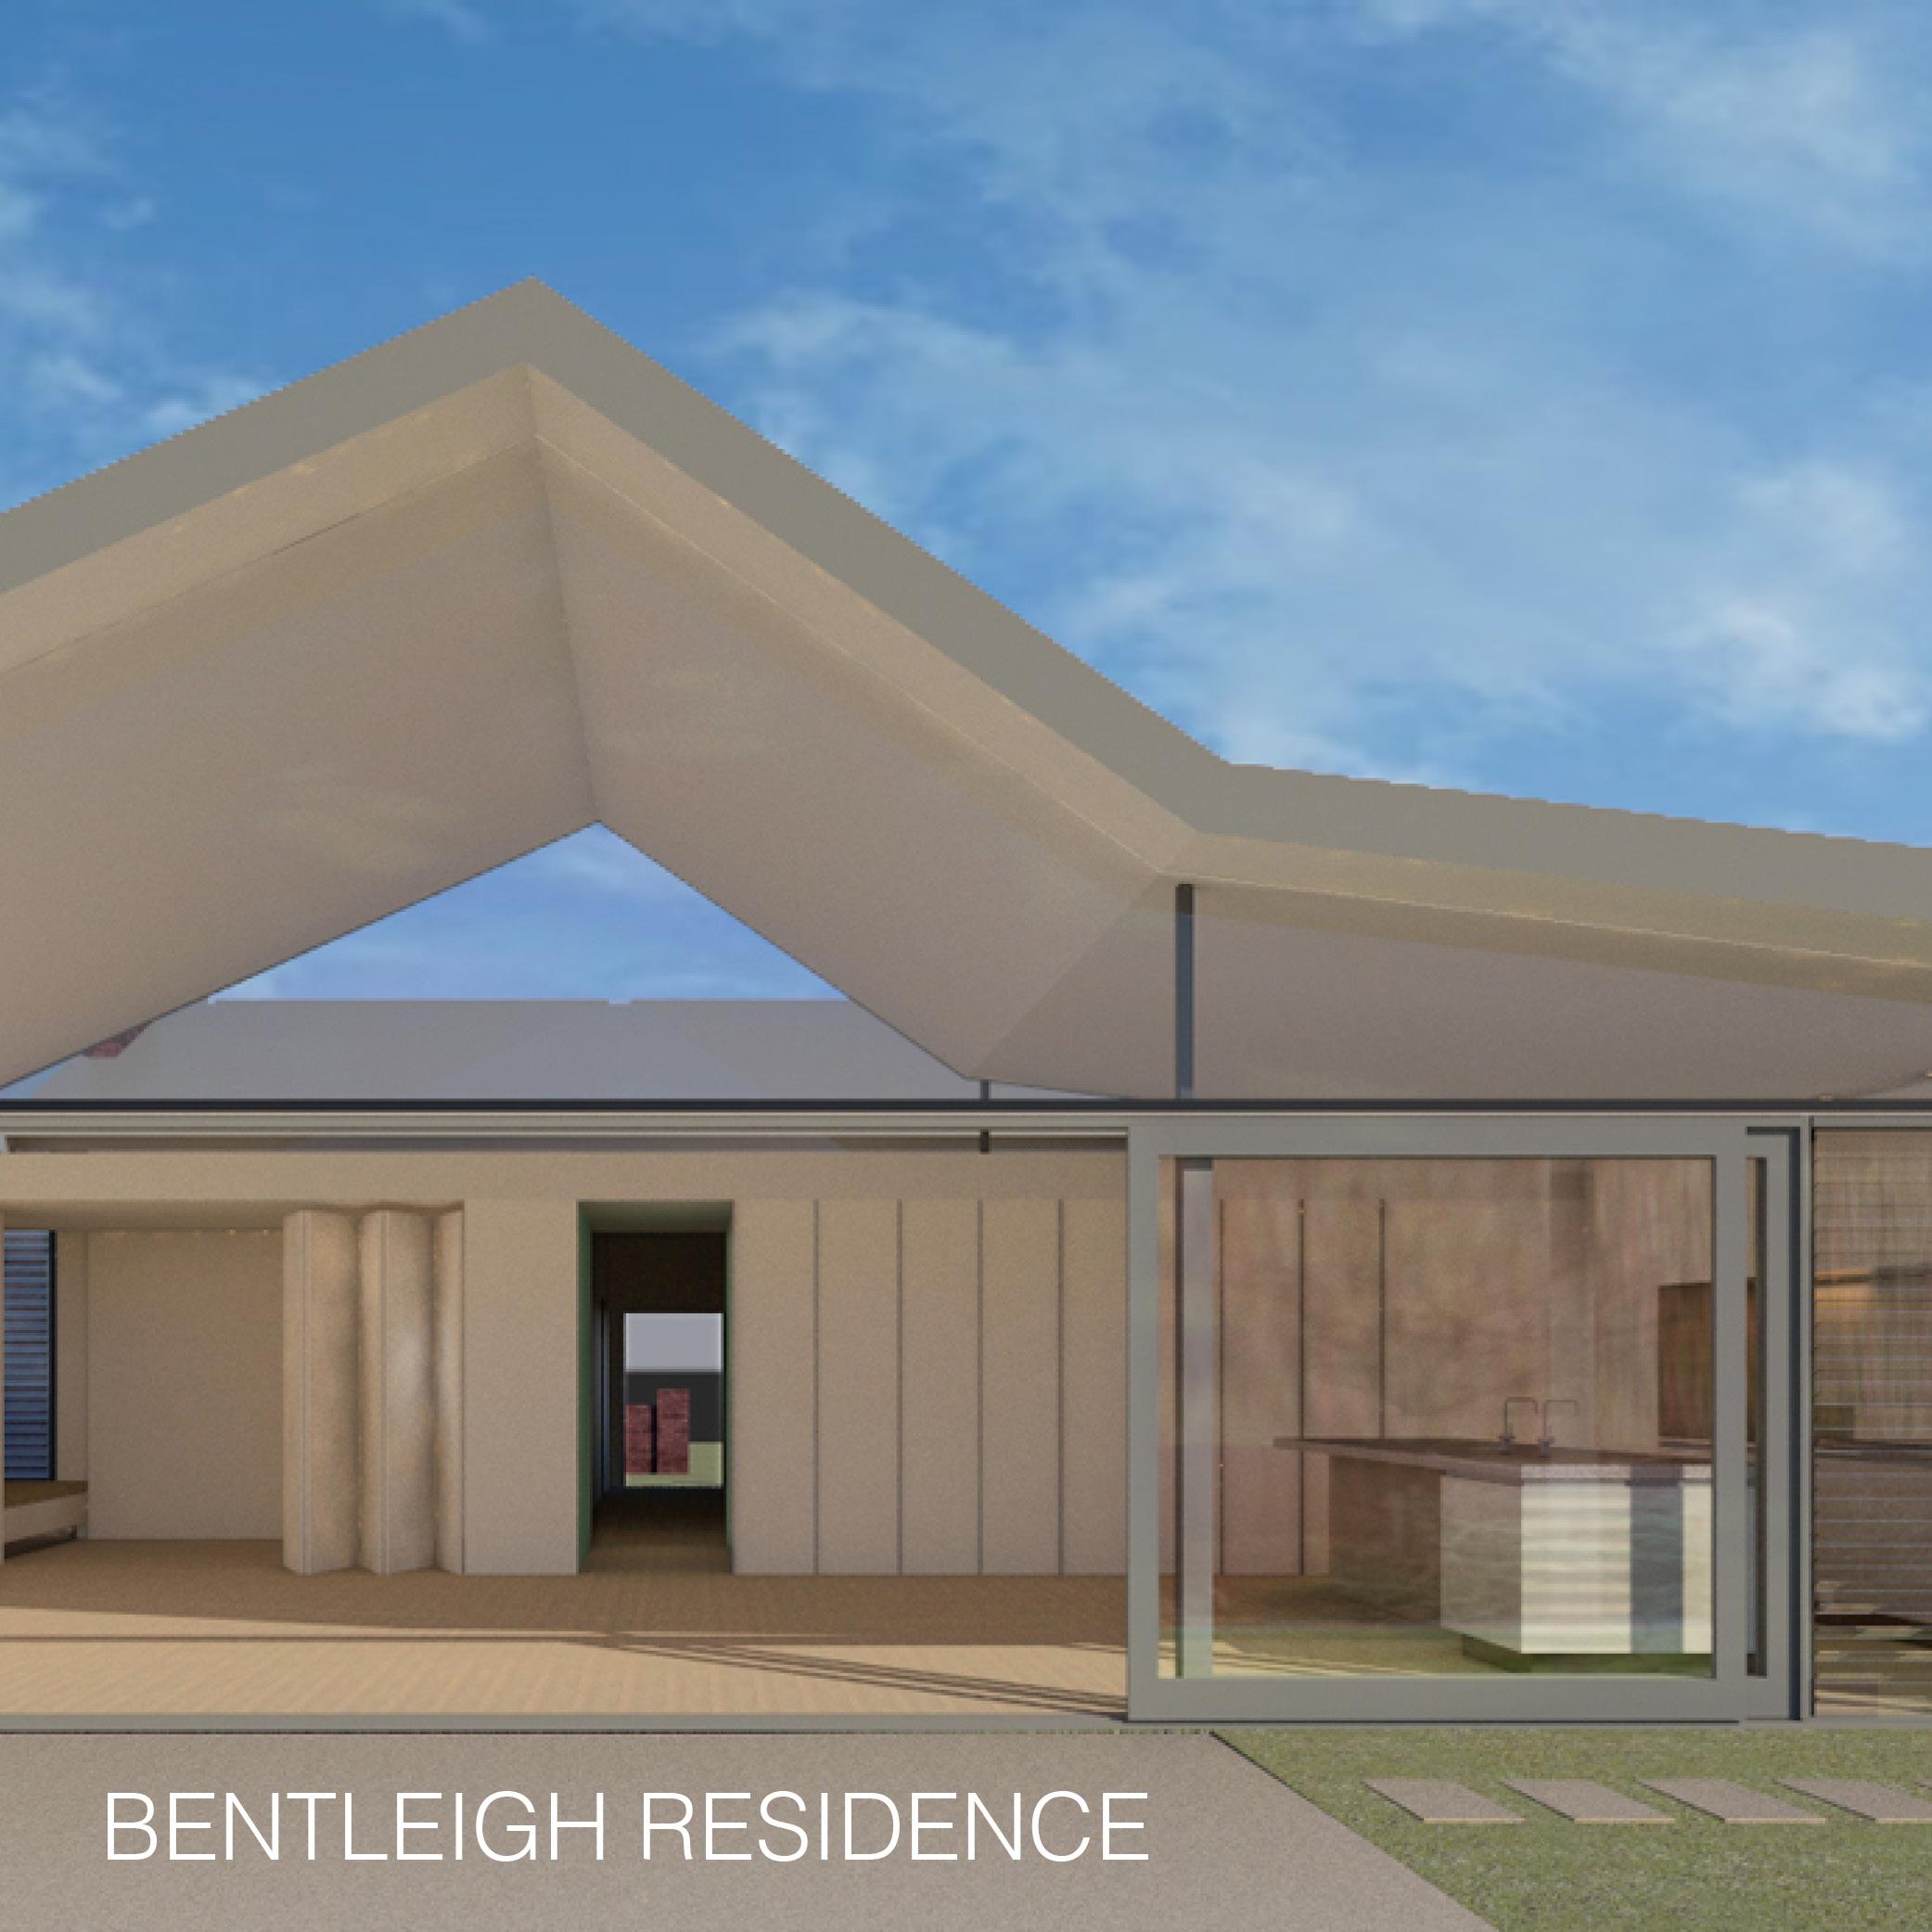 Benteigh Residence